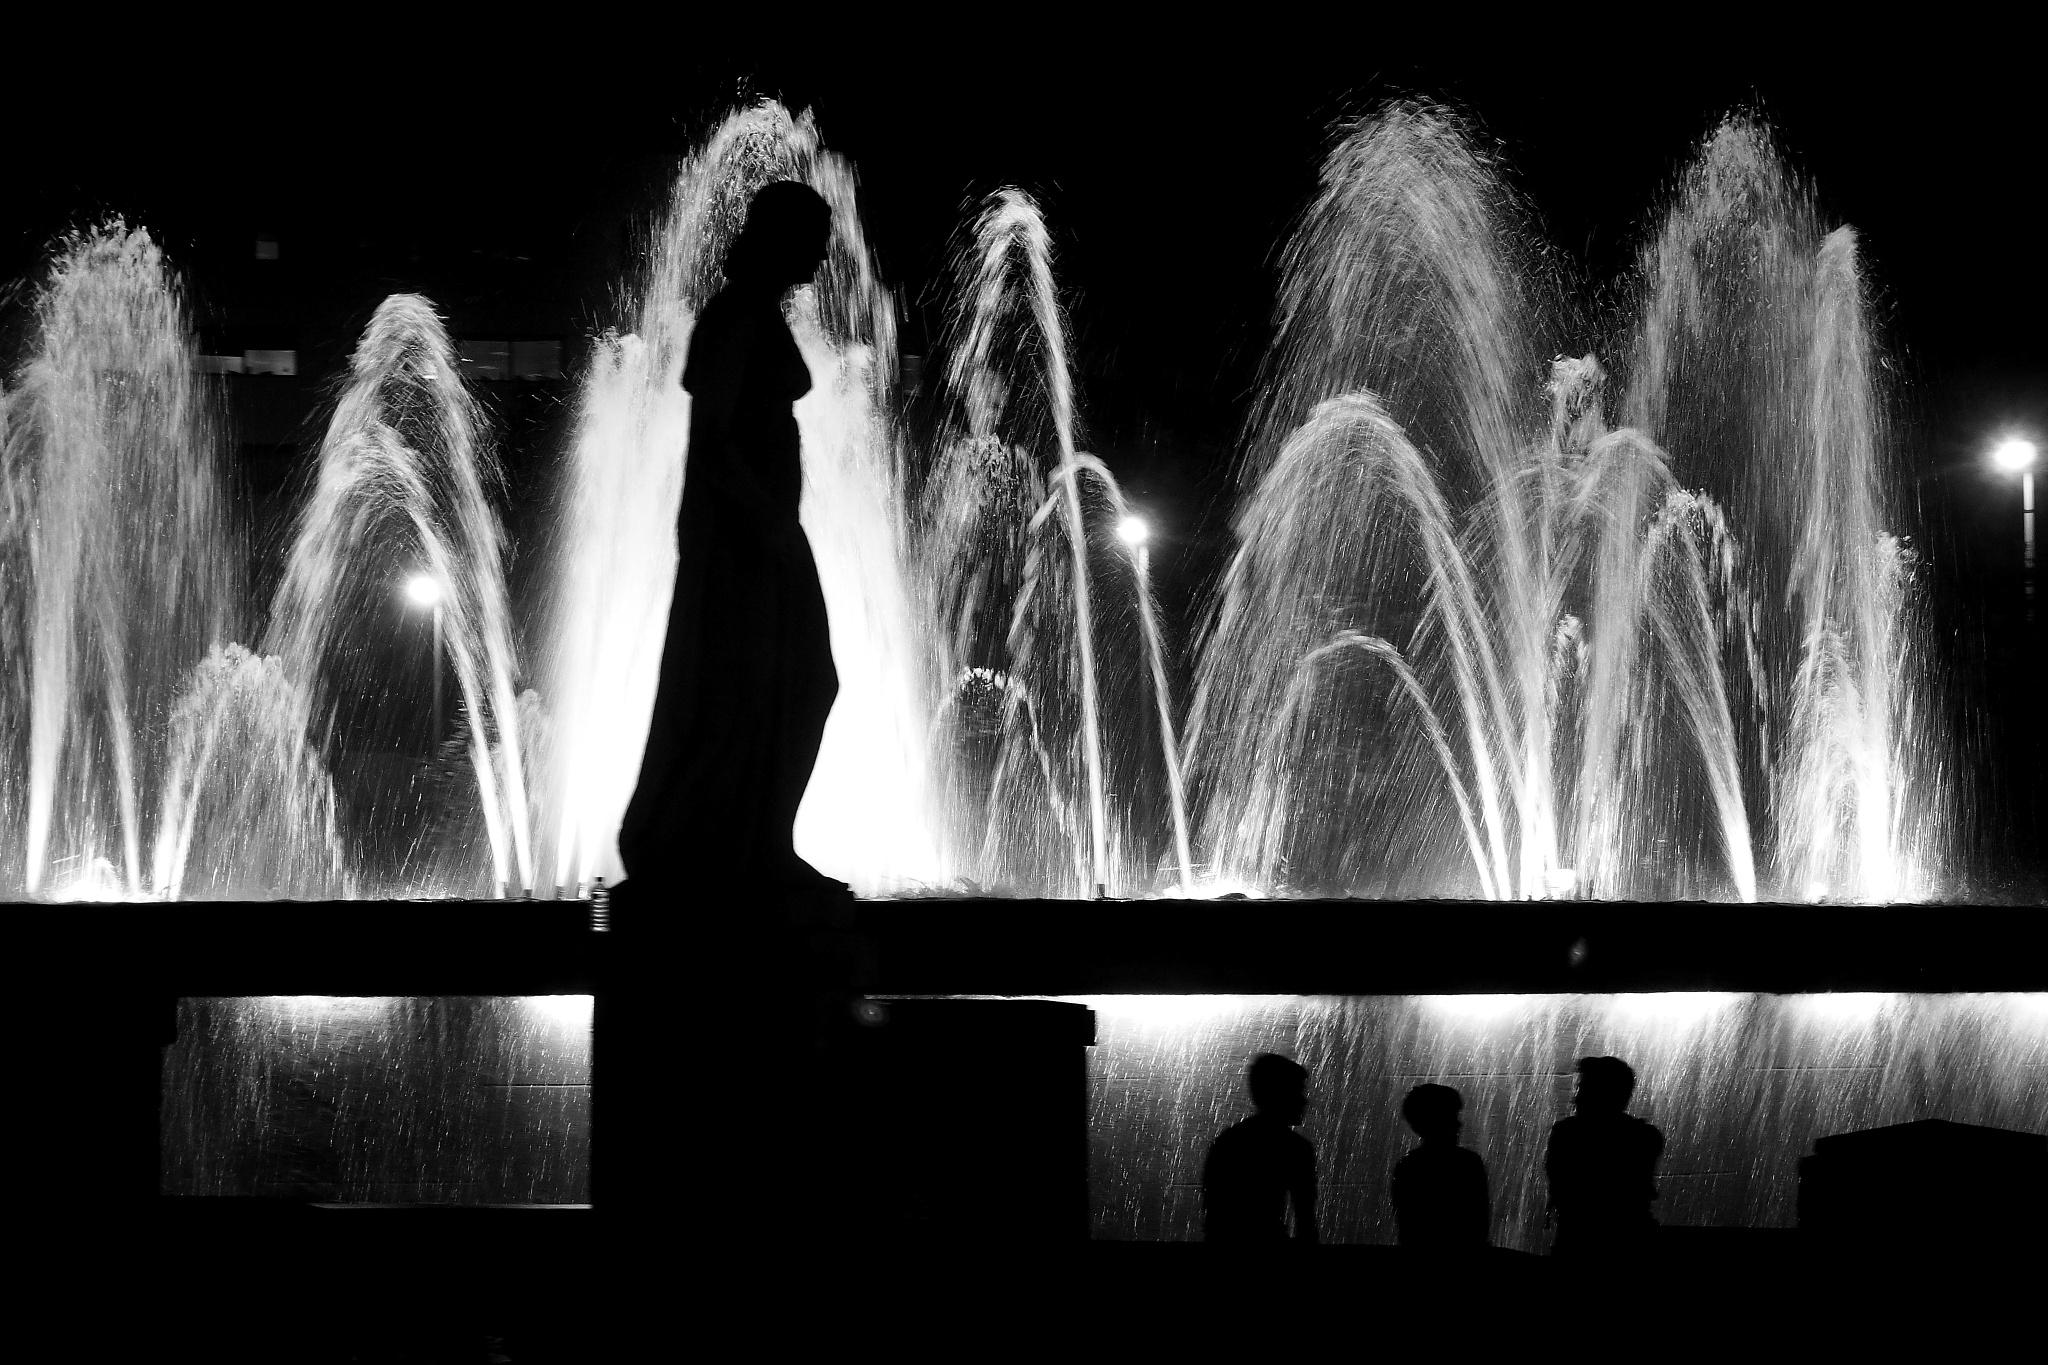 Barcelona, Plaça Catalunya /  Catalunya Square by Rocco Footography